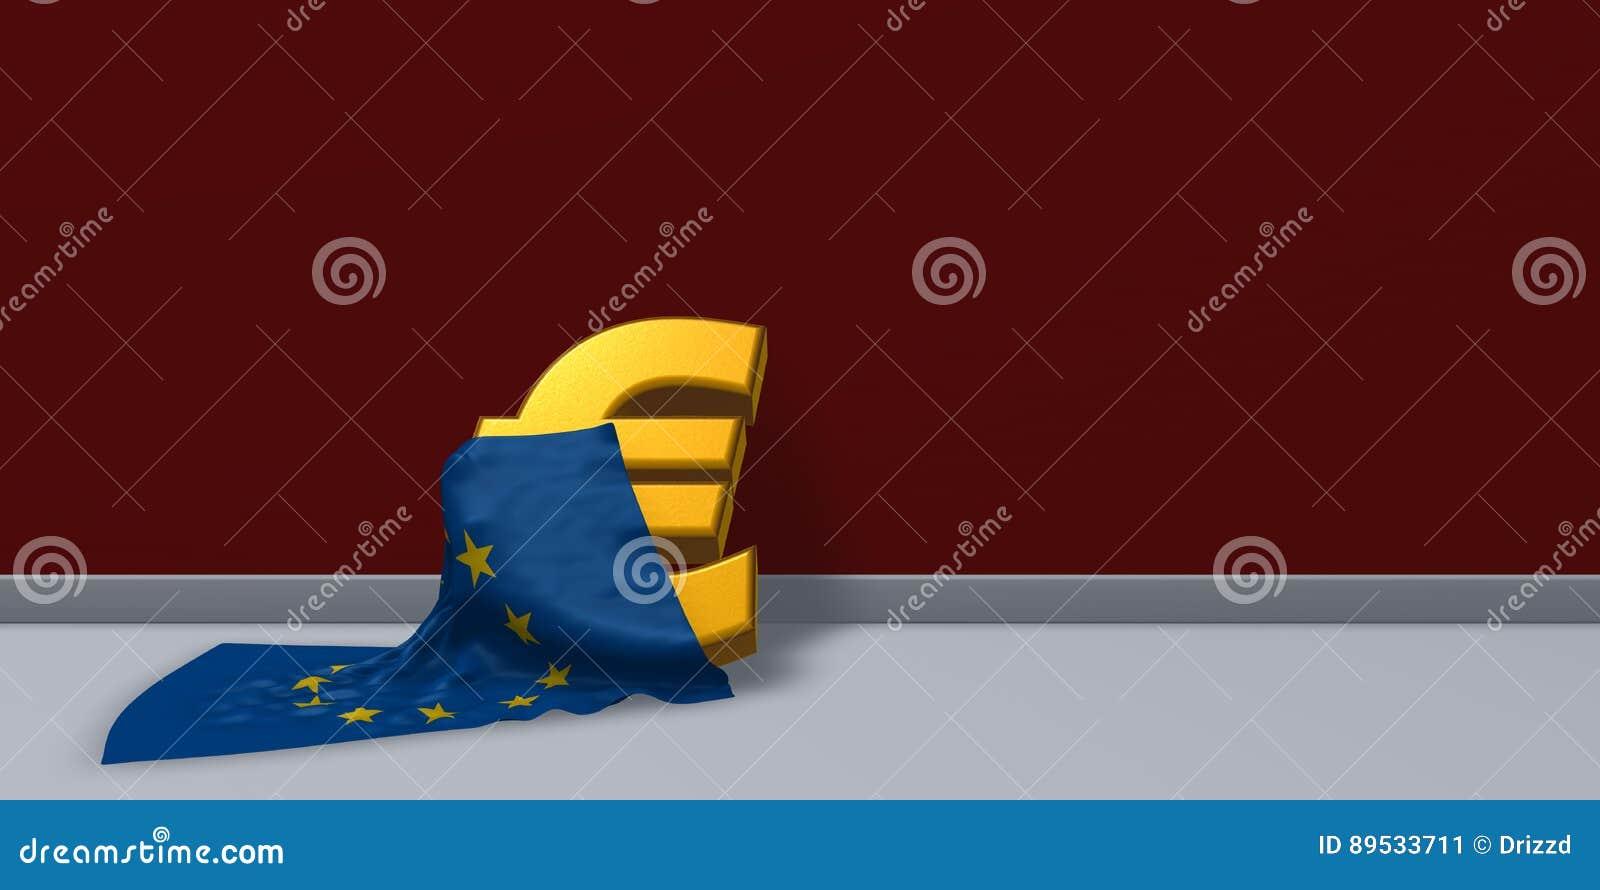 Euro Symbol And European Union Flag Stock Illustration